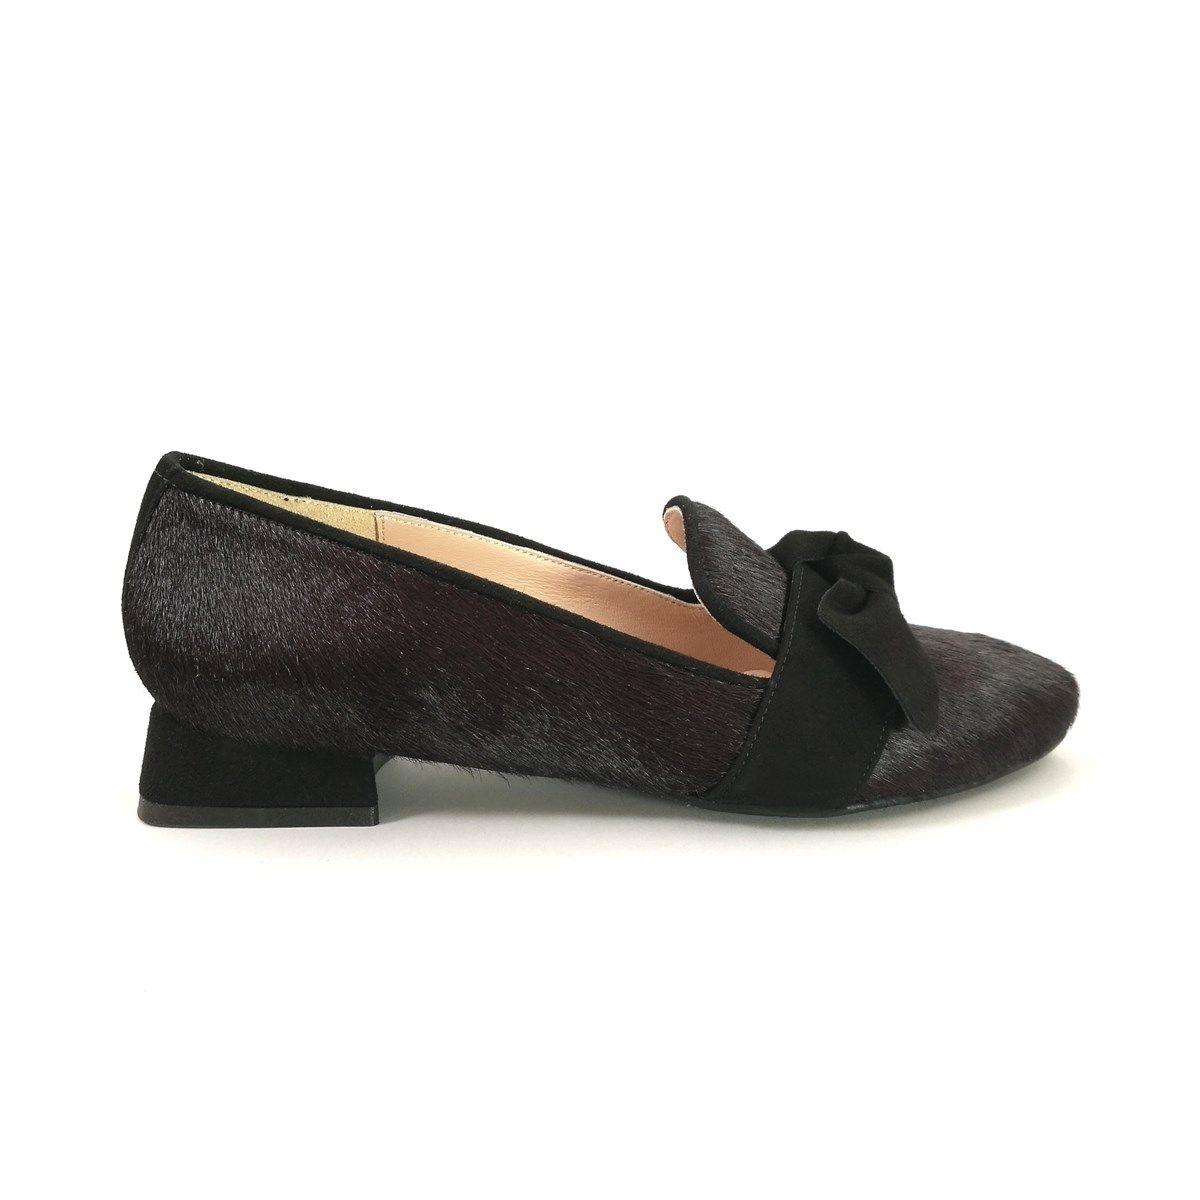 Babies Mocassins femmes cuir bout pointu GIADA LOW  chaussures petites pointures